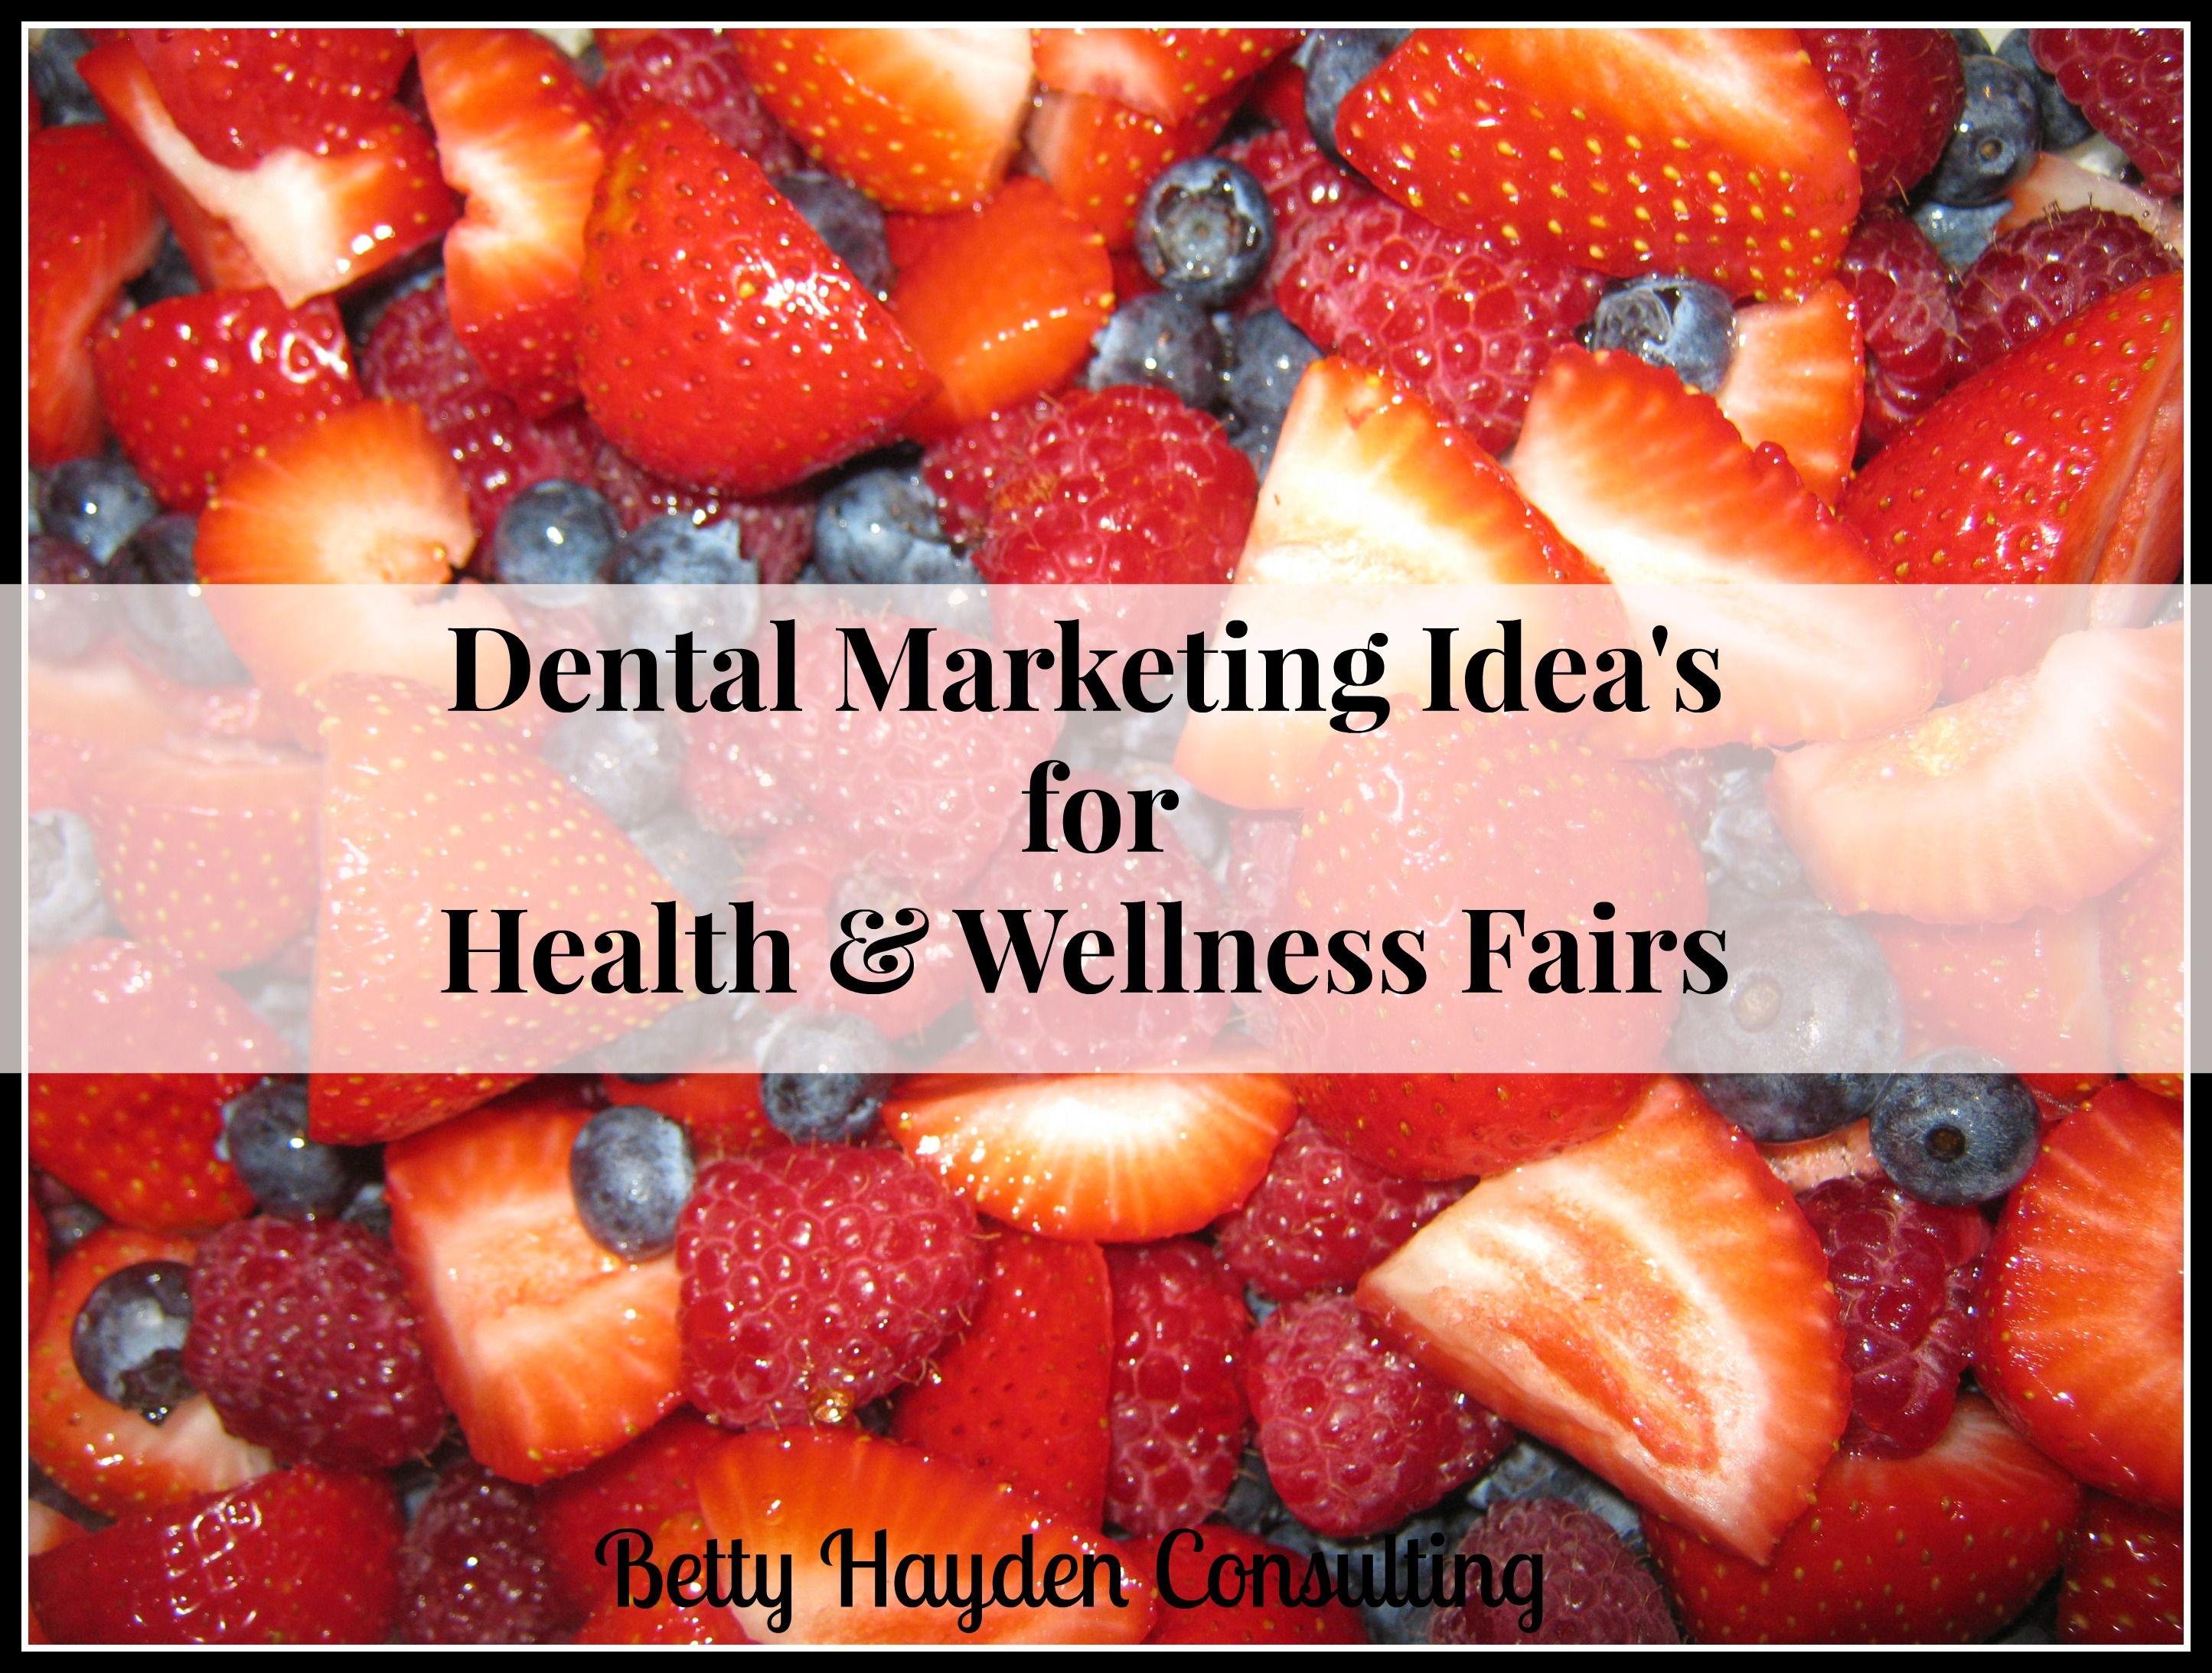 Dental Marketing Ideas For Health And Wellness Fairs